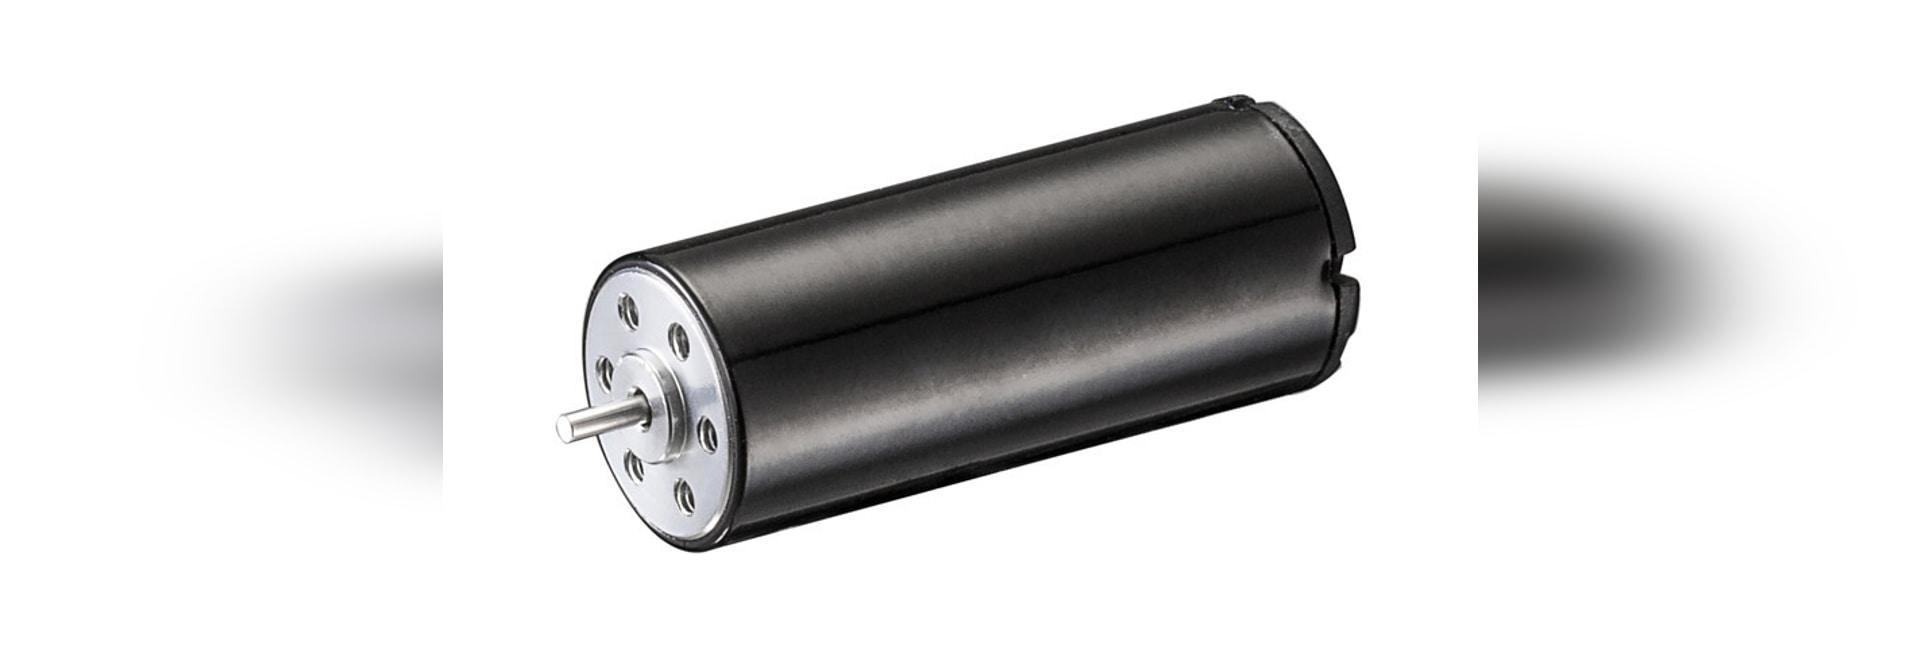 Bürsten-Motor CL1640M Coreless /Ironless